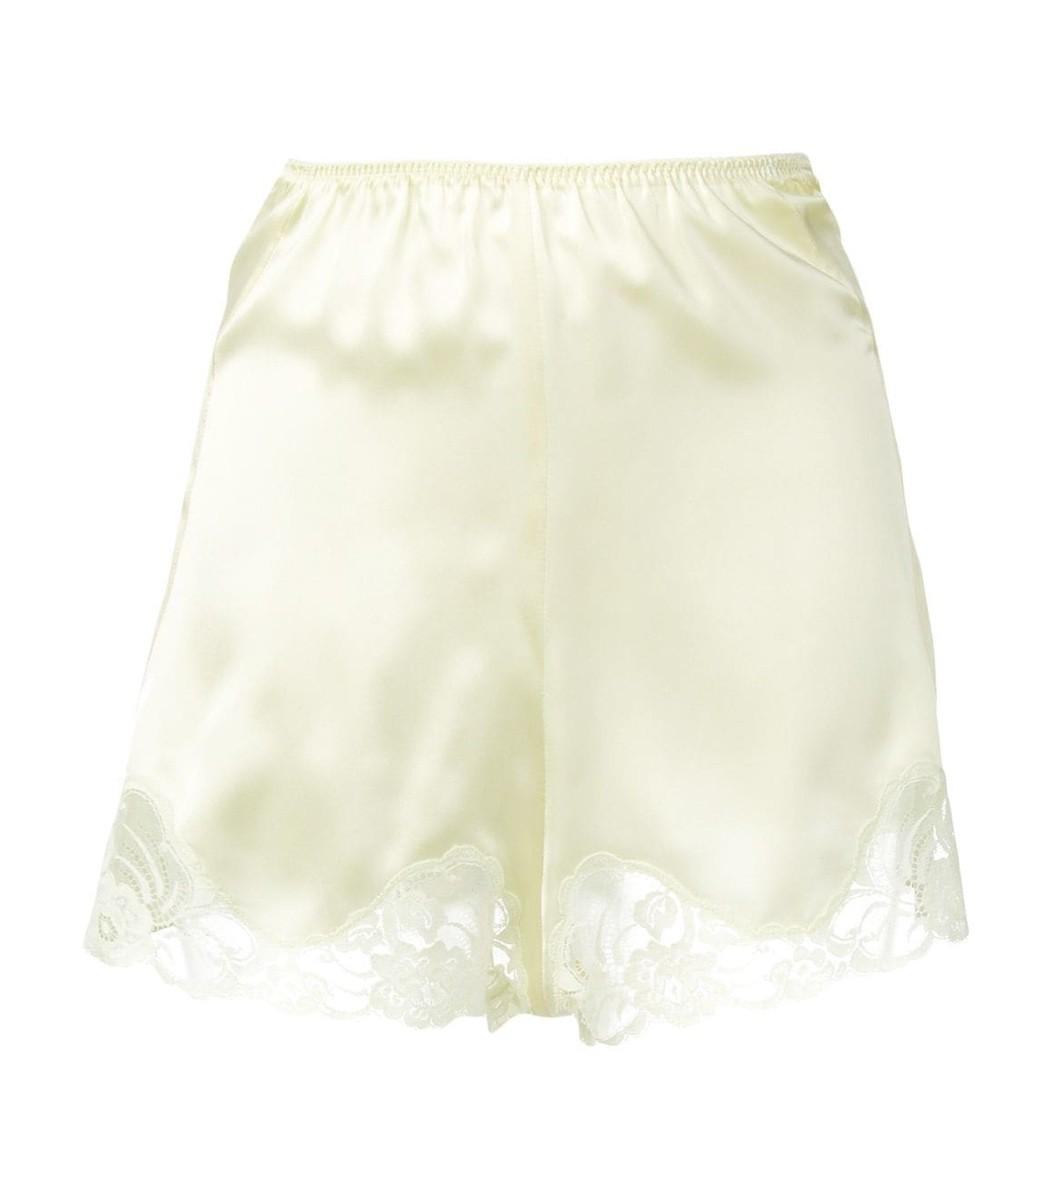 efdde64527508 STELLA MCCARTNEY Lace Trim Satin Shorts in Yellow